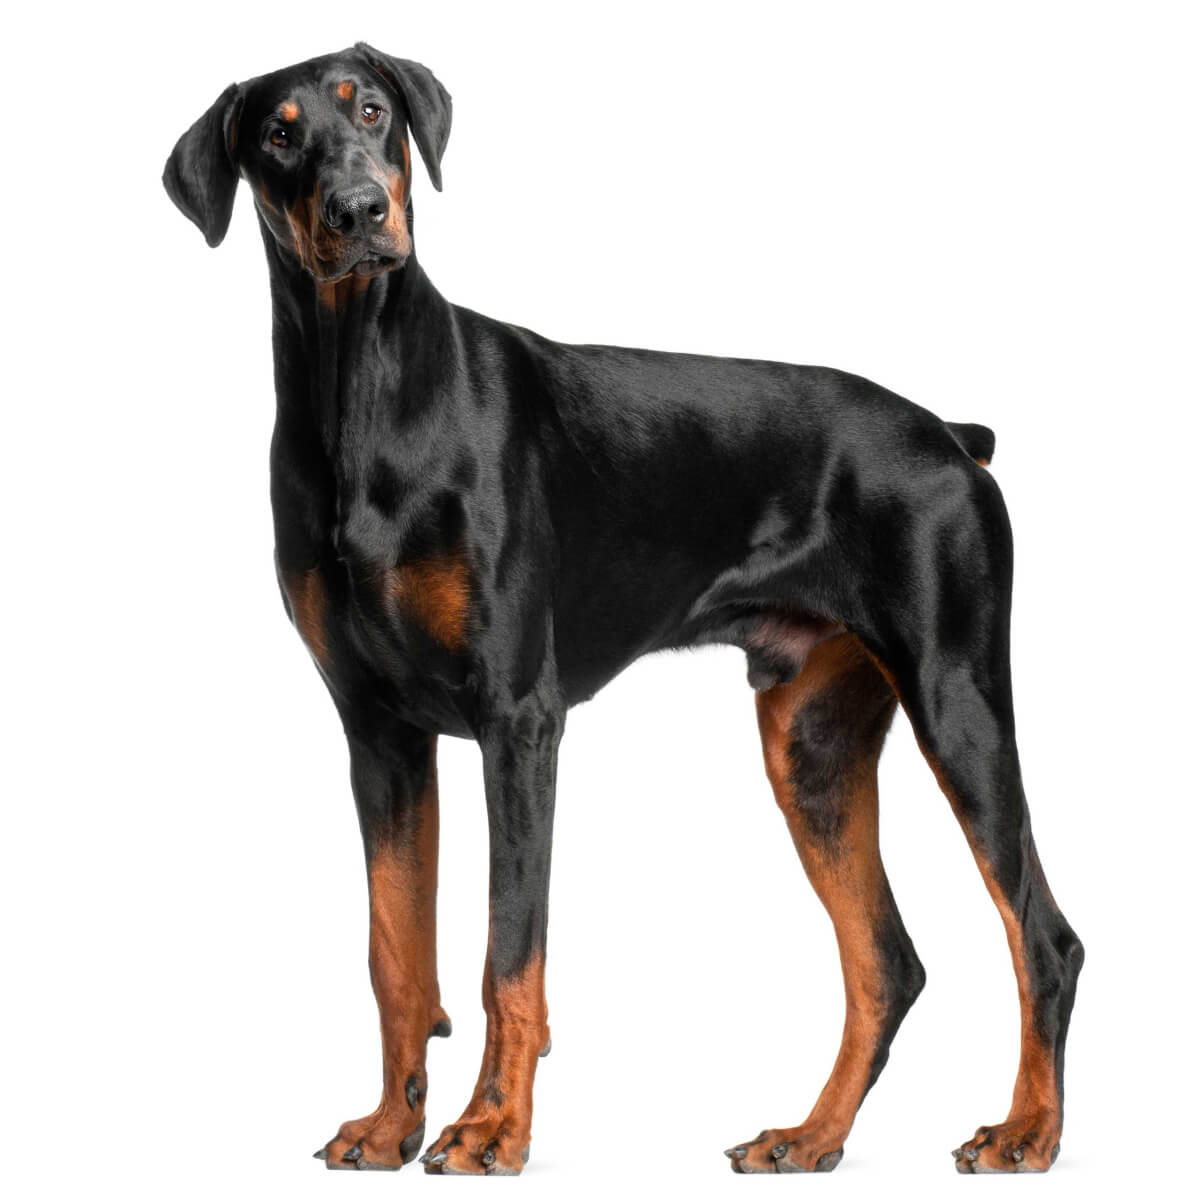 Doberman Pinscher Dog Breed » Everything About Dobermans